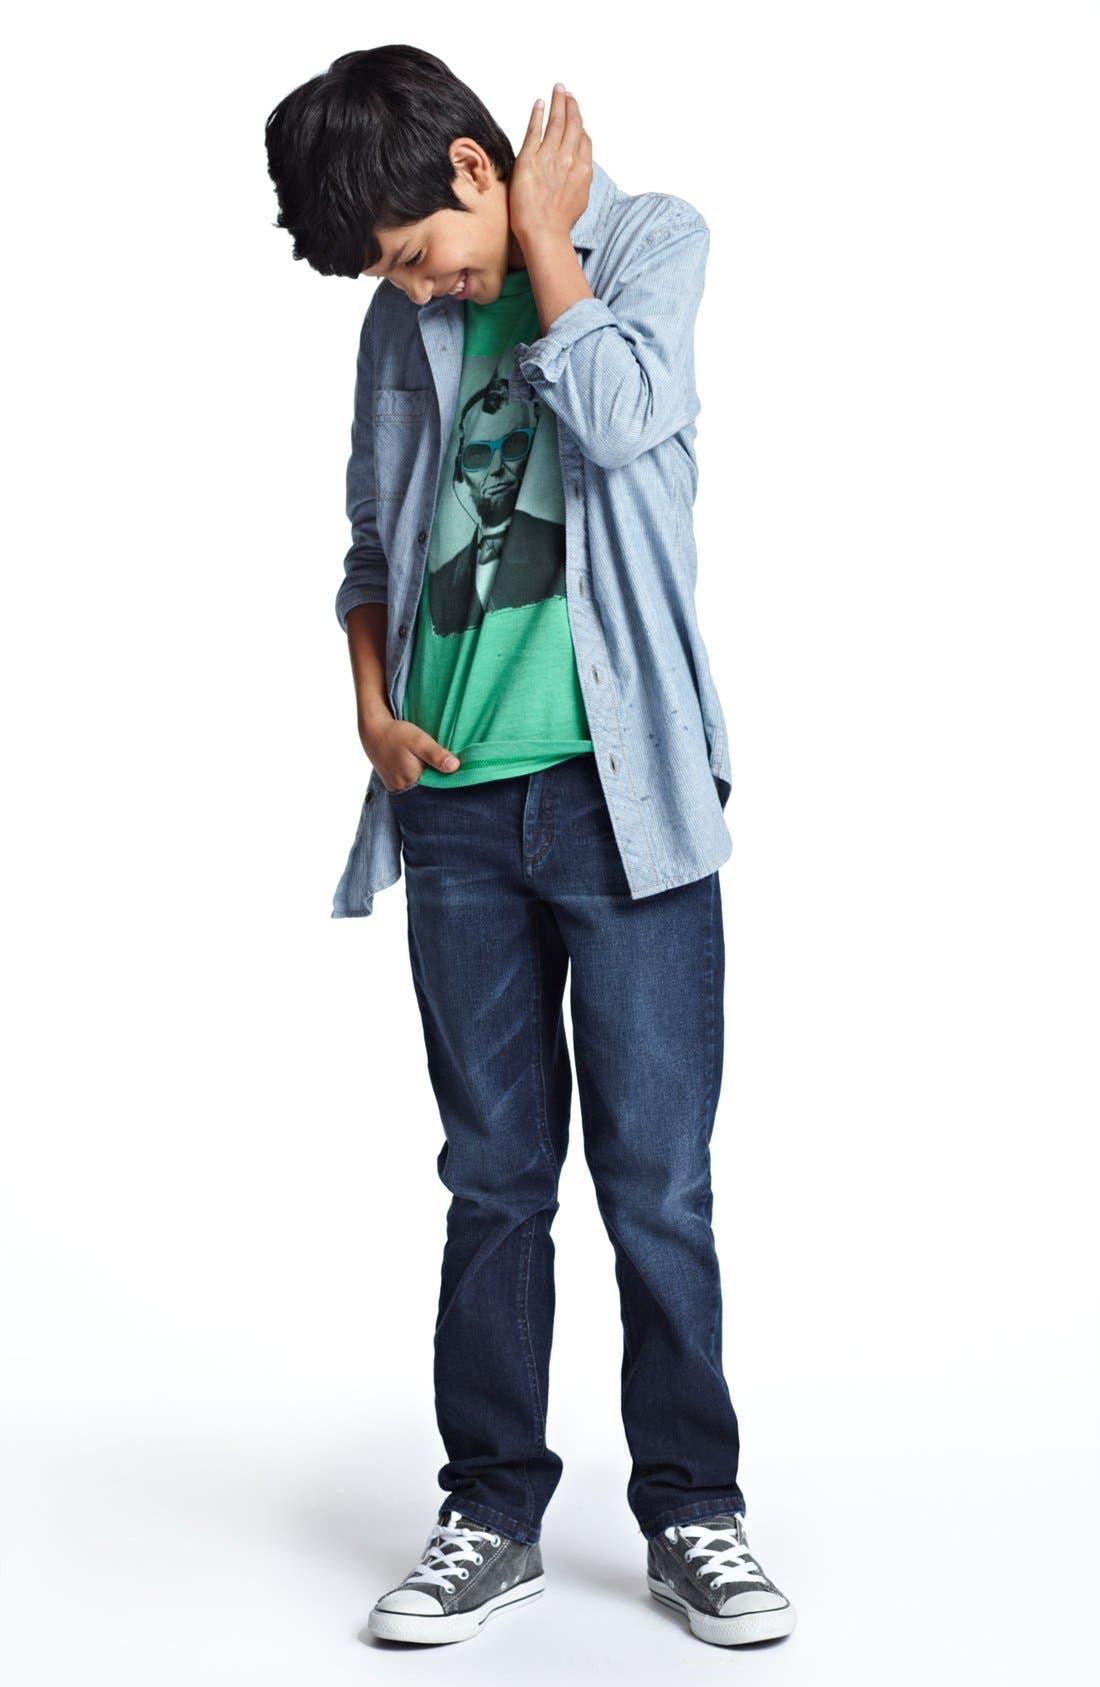 Alternate Image 1 Selected - Tucker + Tate Shirt, Jem T-Shirt & Volcom Jeans (Big Boys)